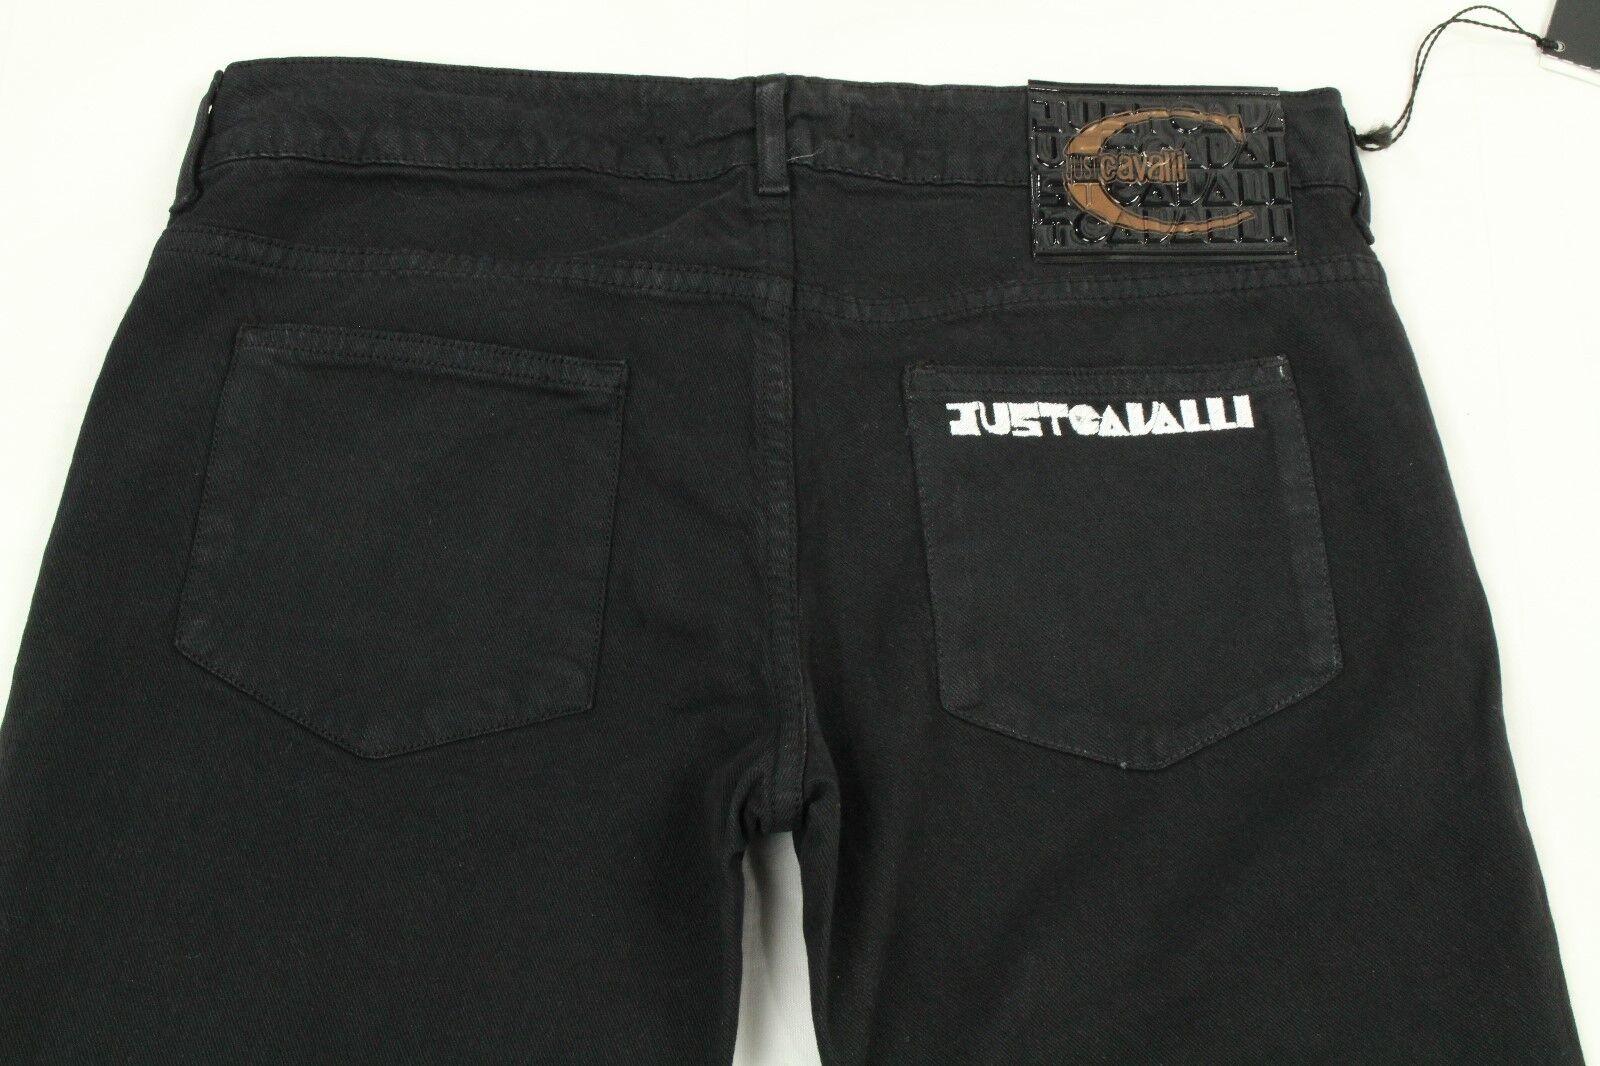 Just Cavalli Damen Jeans Distressed Schwarz Skinny Stretch Größe 30